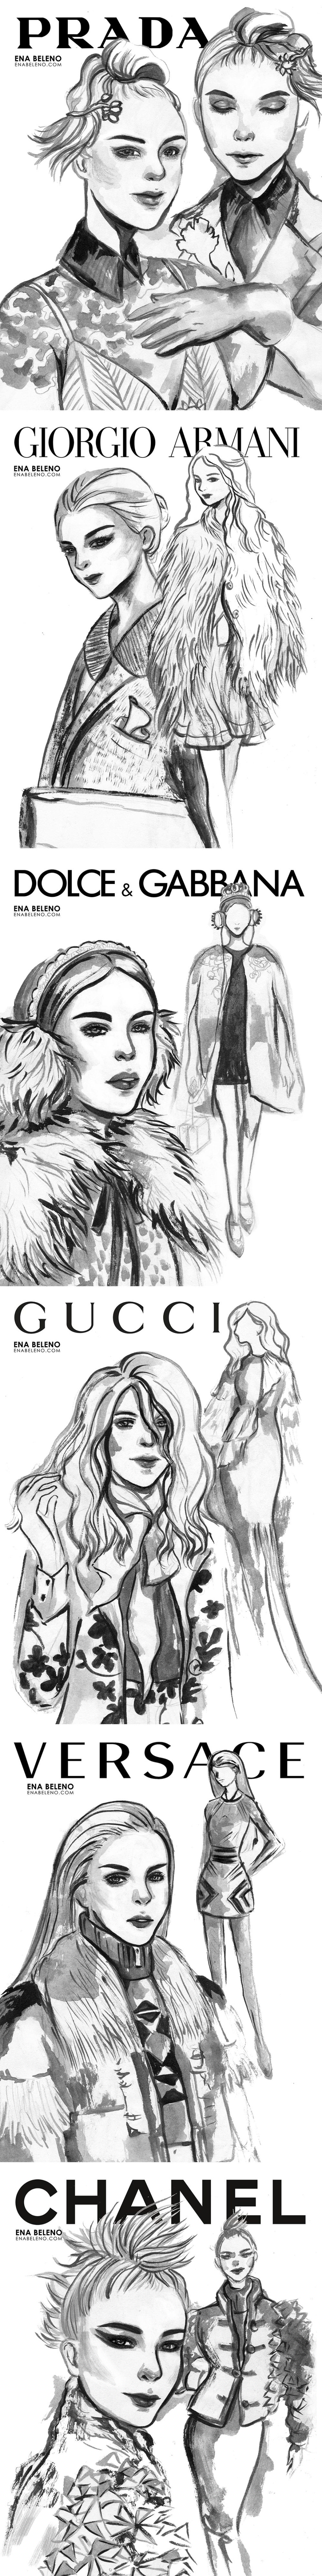 Fashion Illustration by ena beleno